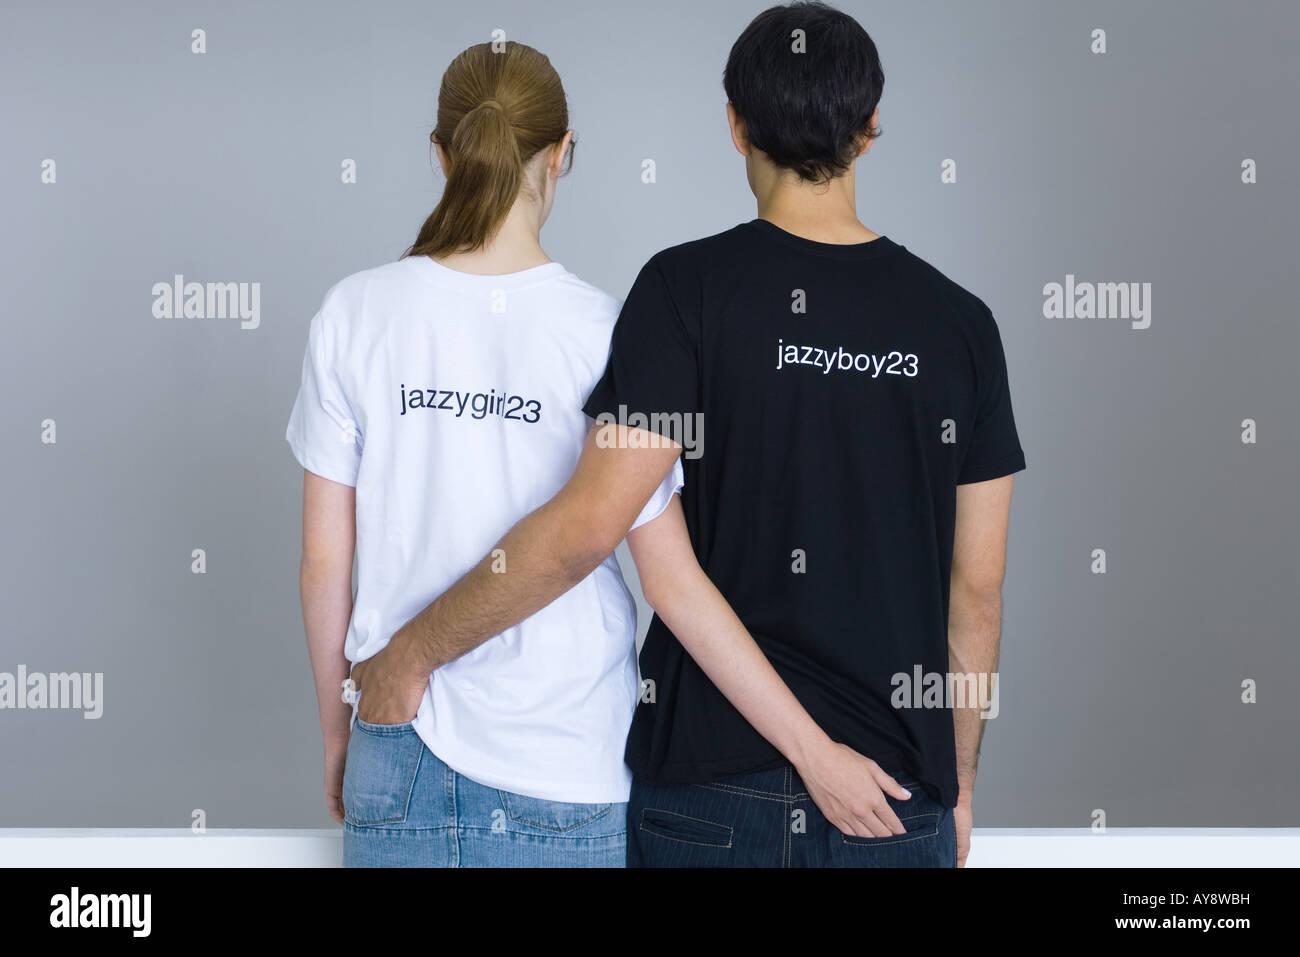 Slogan T Shirts Stock Photos Slogan T Shirts Stock Images Alamy